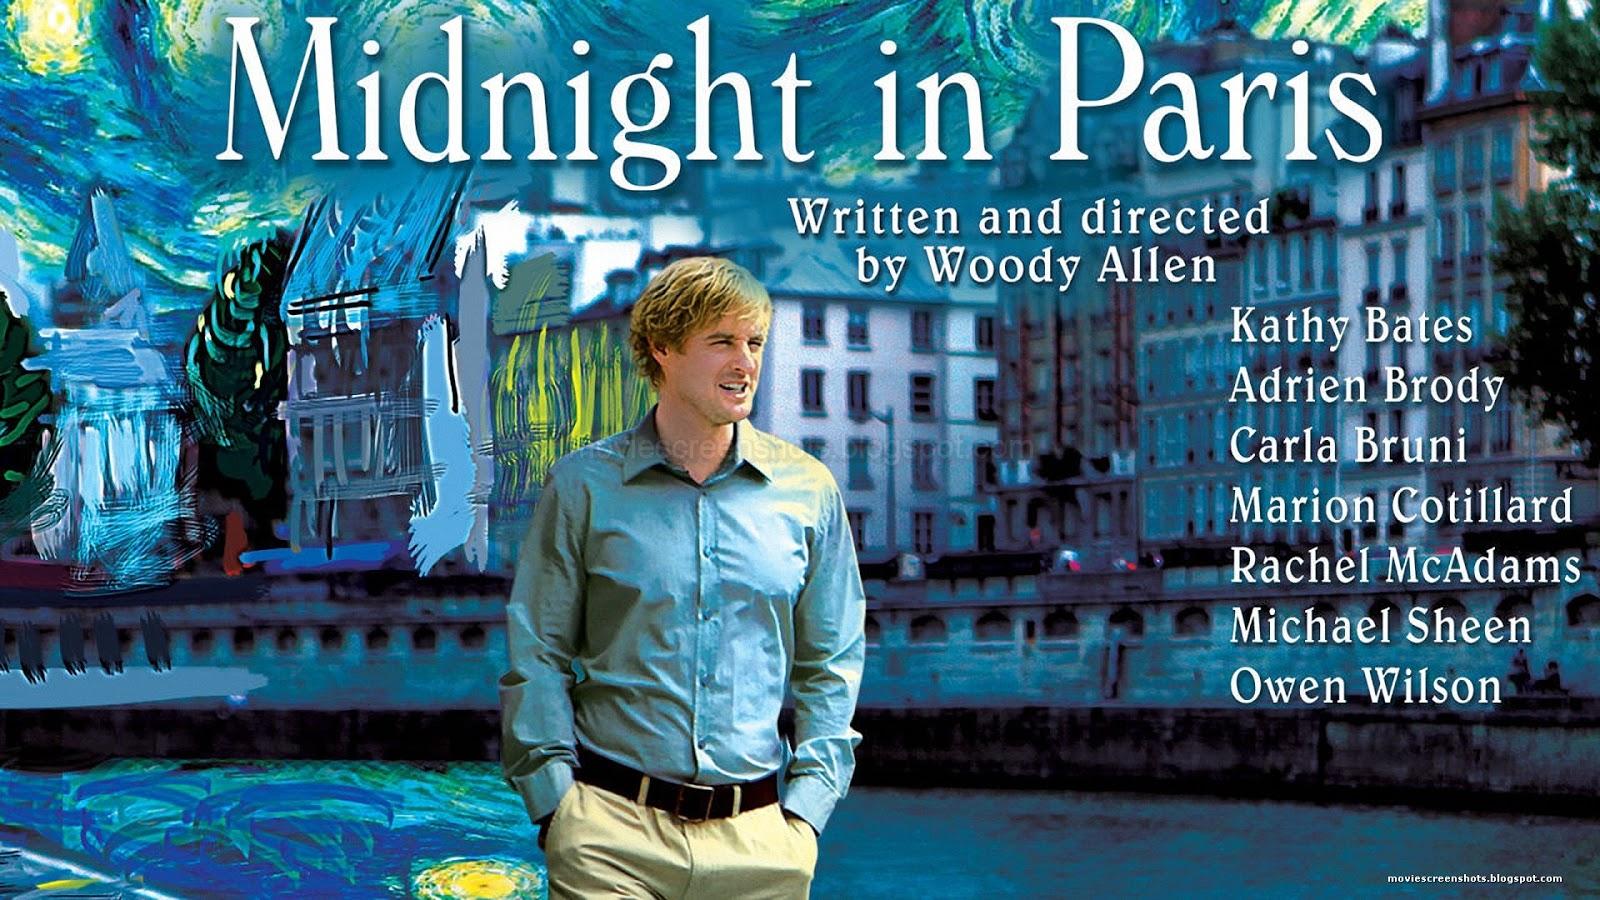 Imdb Midnight In Paris